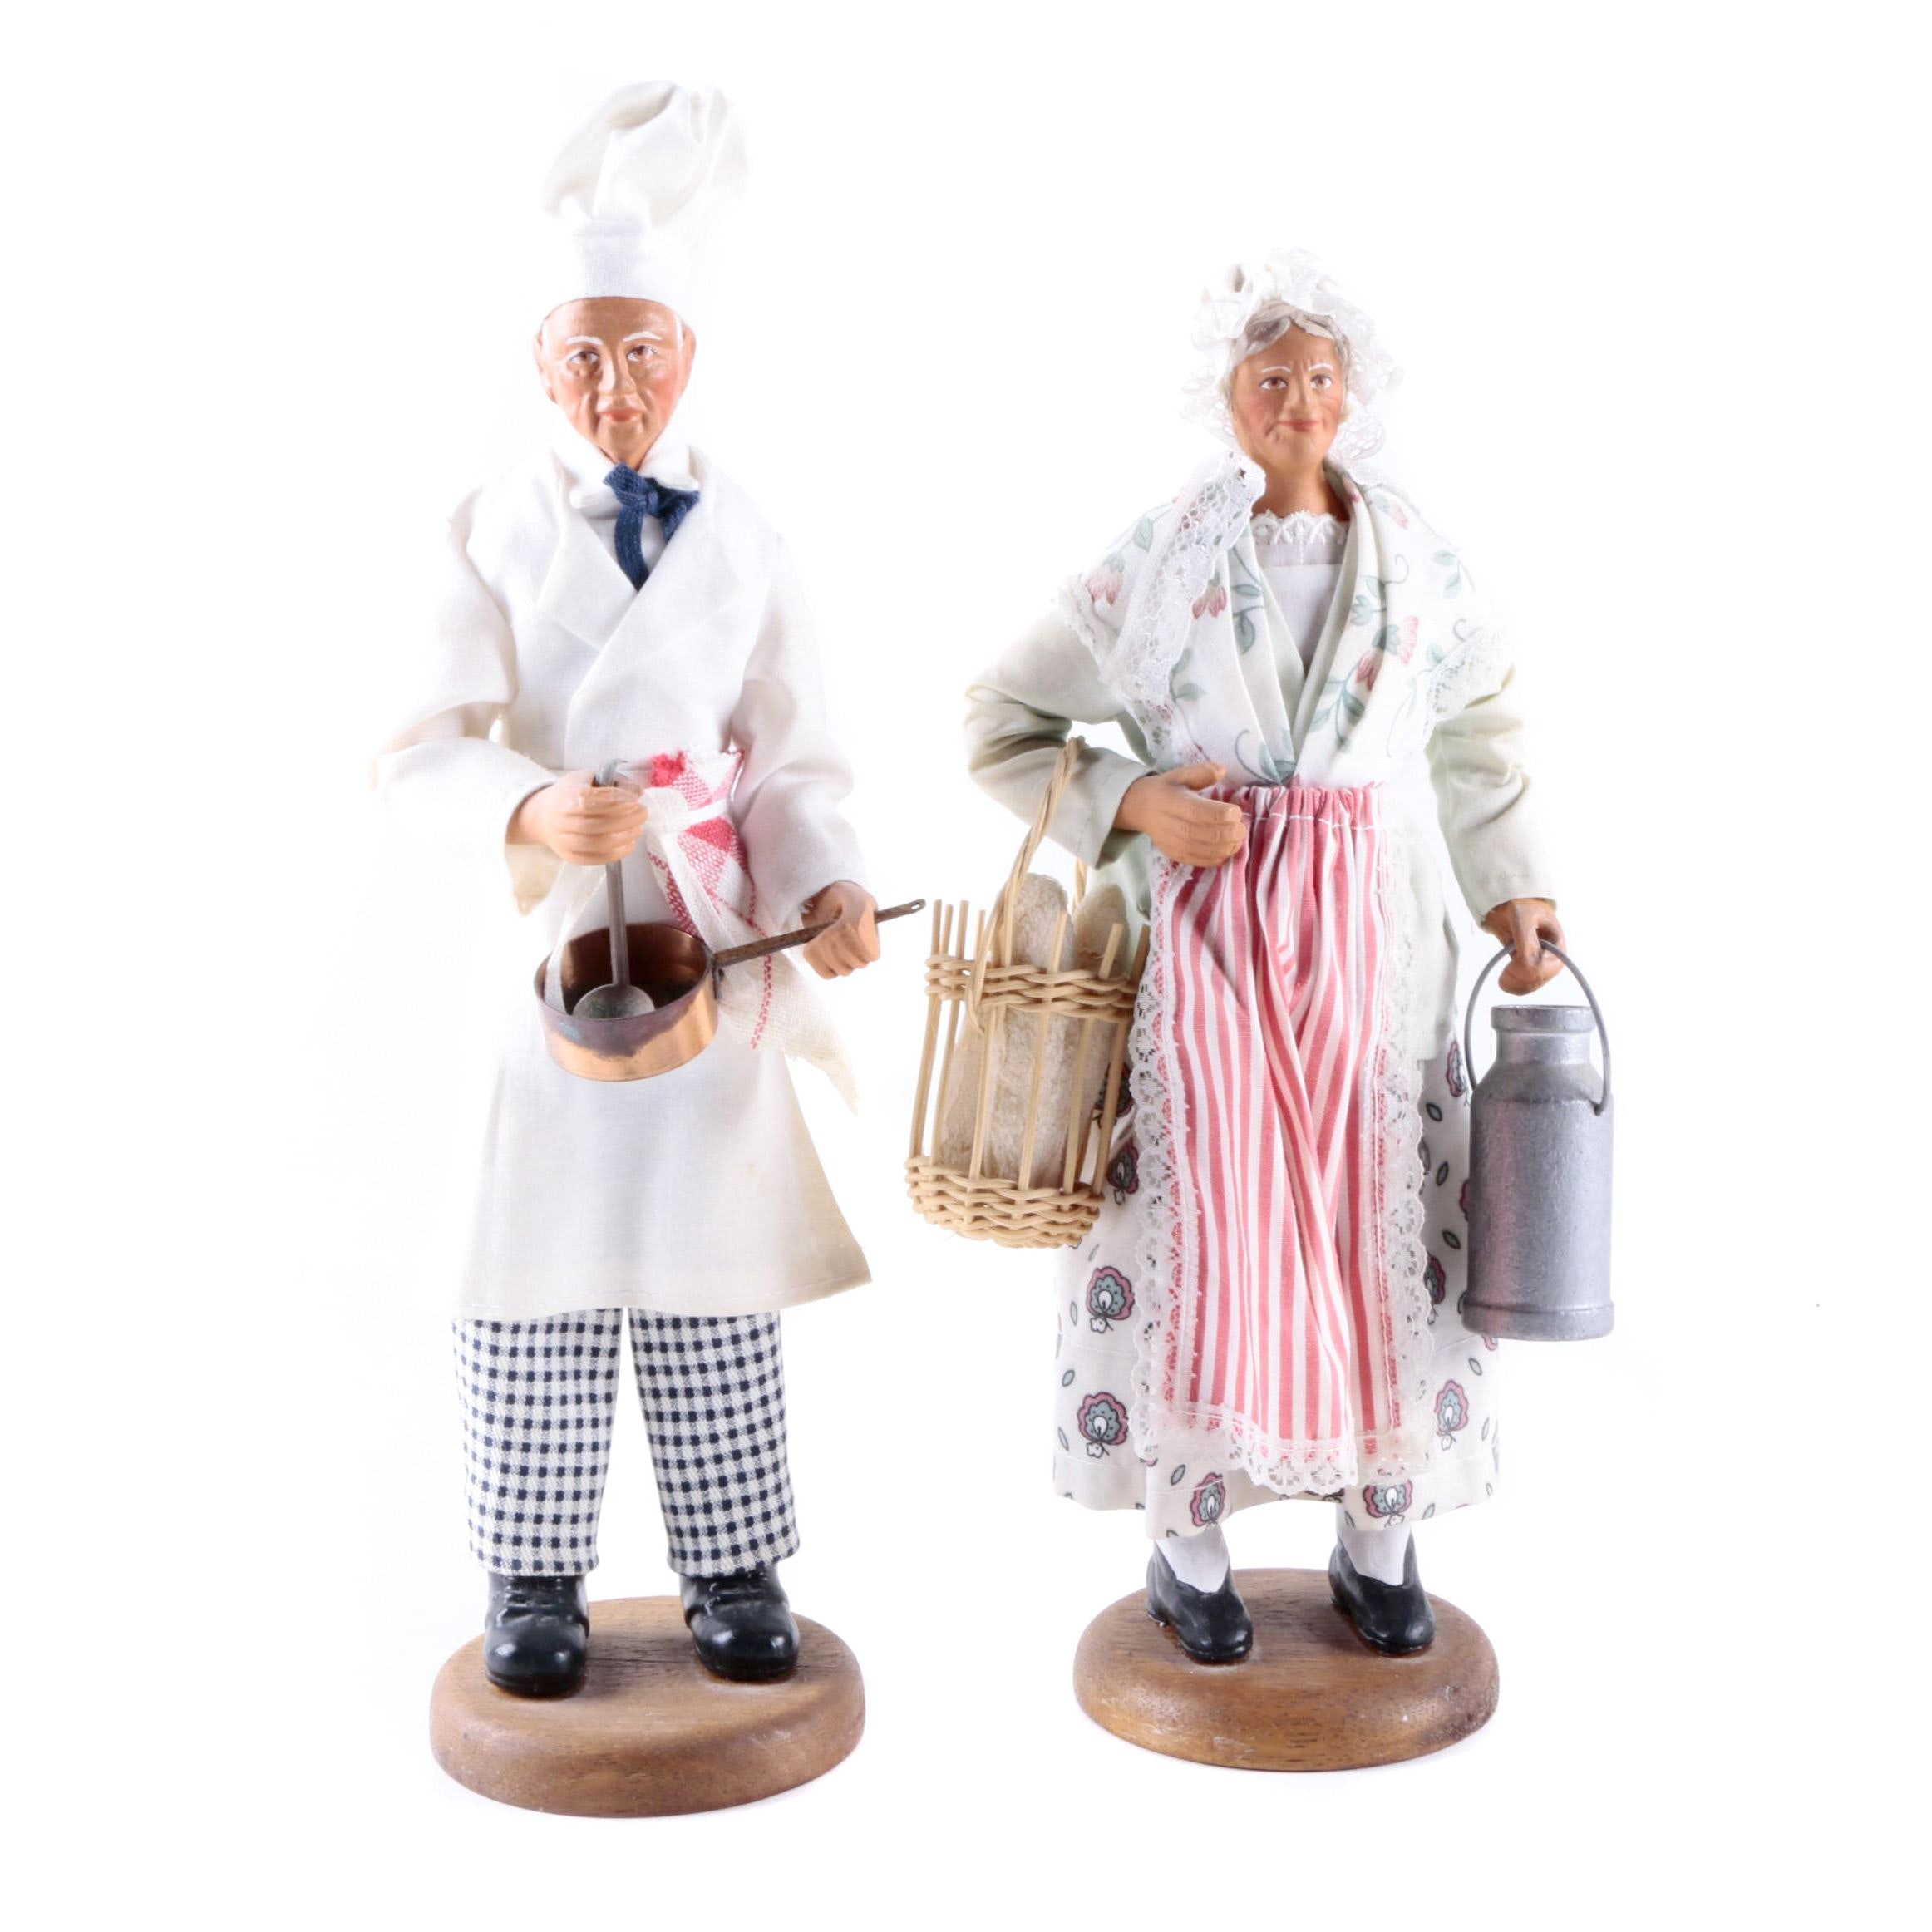 Elder Farmer Figurines